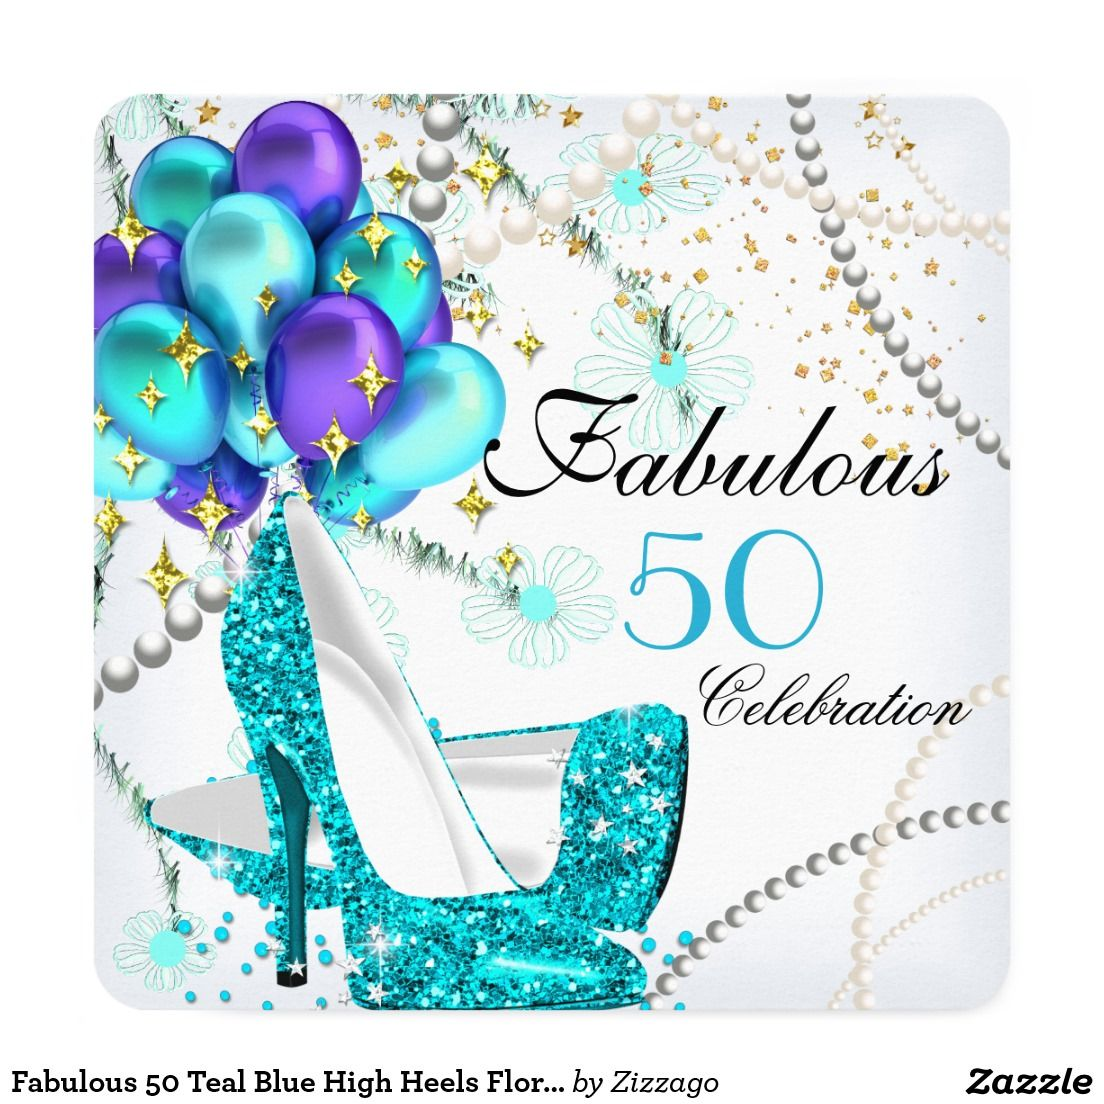 Fabulous 50 Teal Blue High Heels Floral Birthday Invitation ...